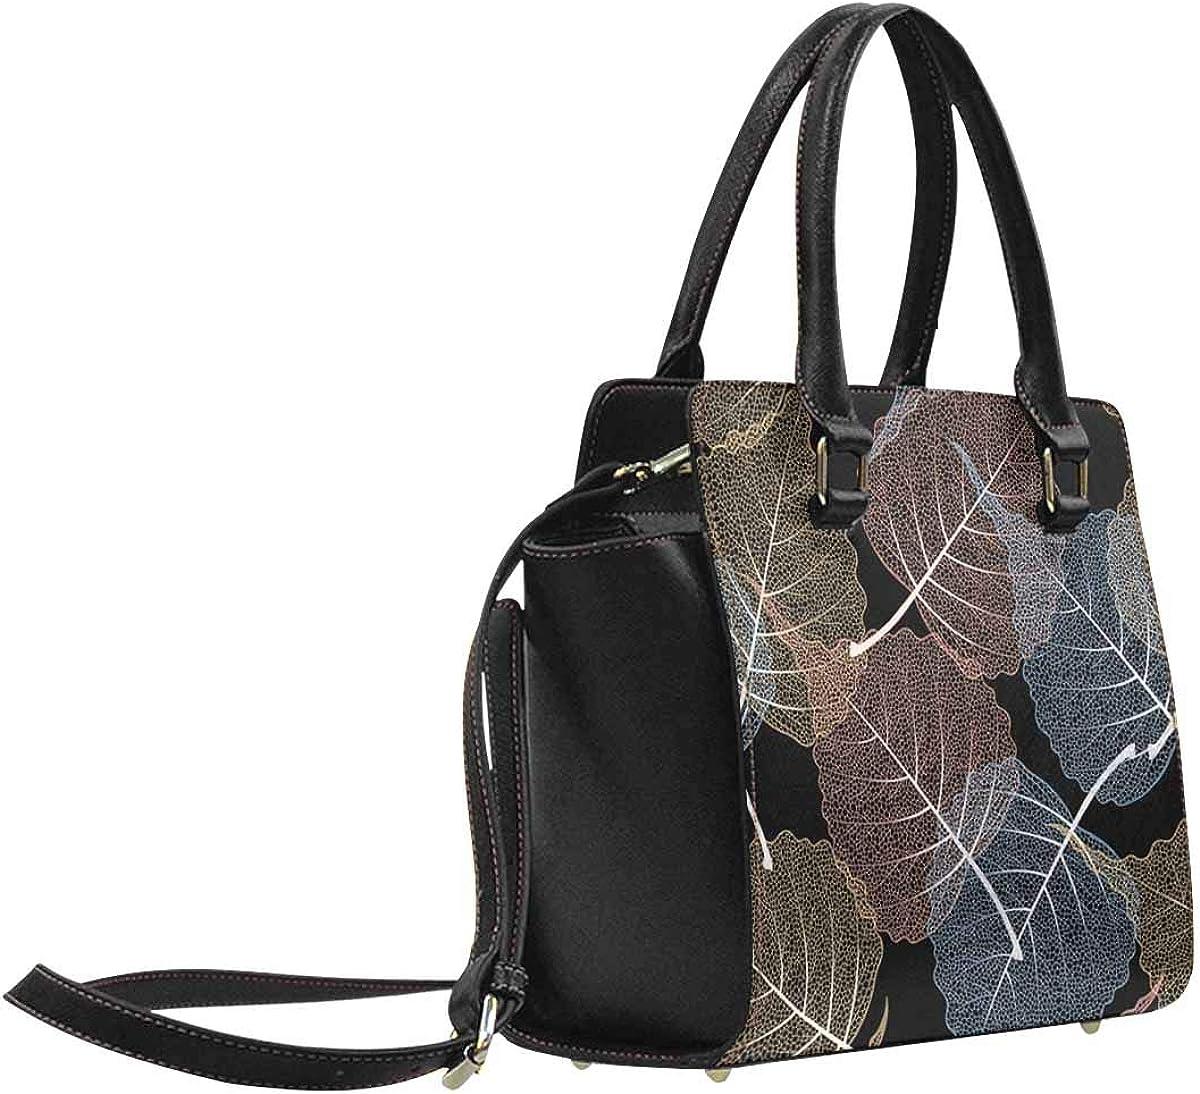 INTERESTPRINT High Detail Skeleton Leaf Woman Tote Casual Bags Crossbody Bag